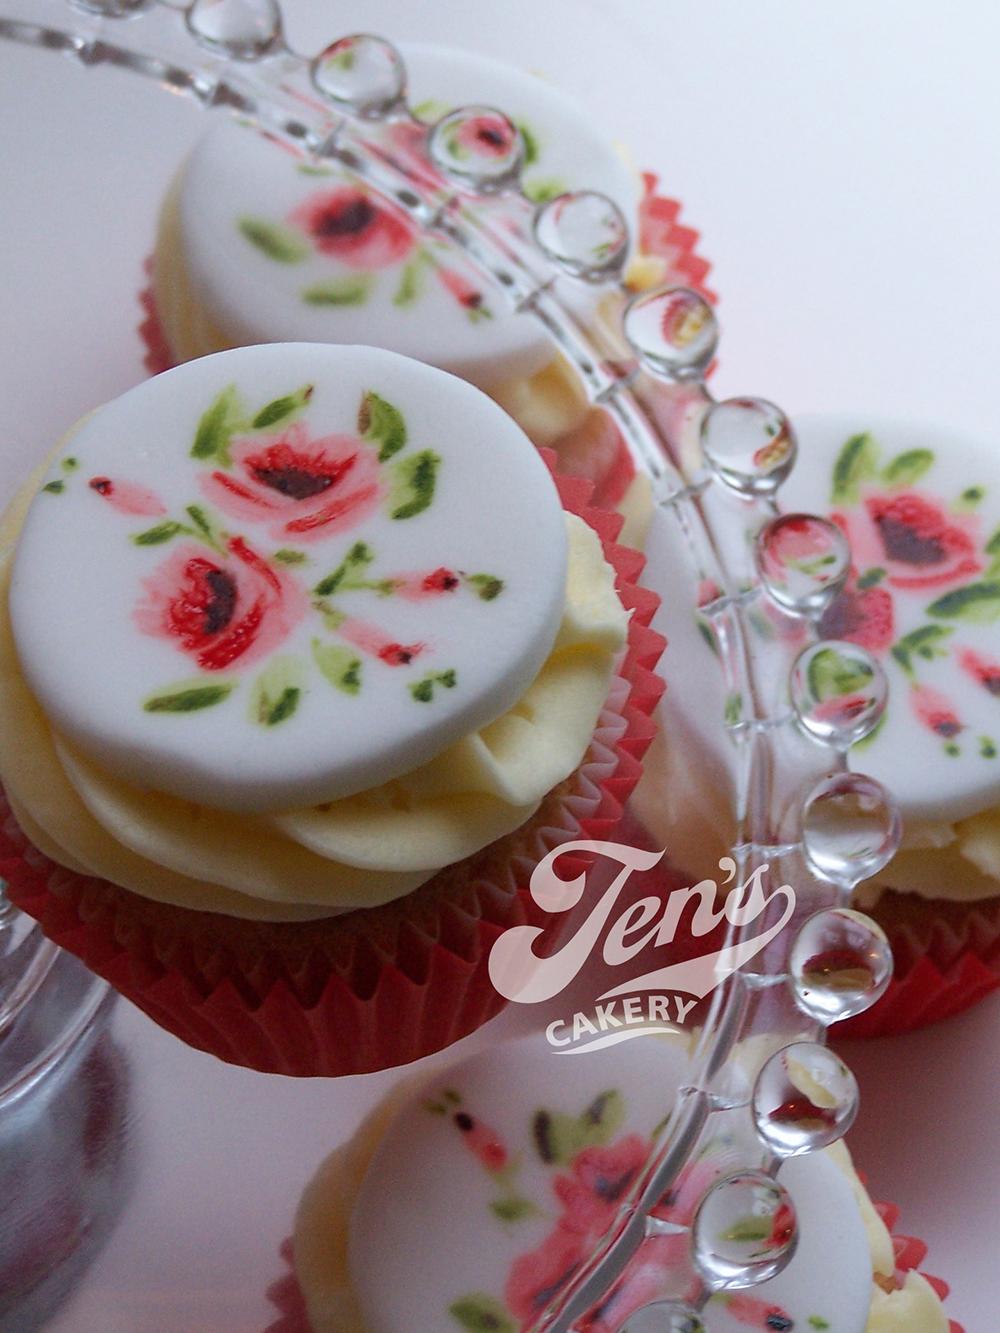 Handpainted cupcakes